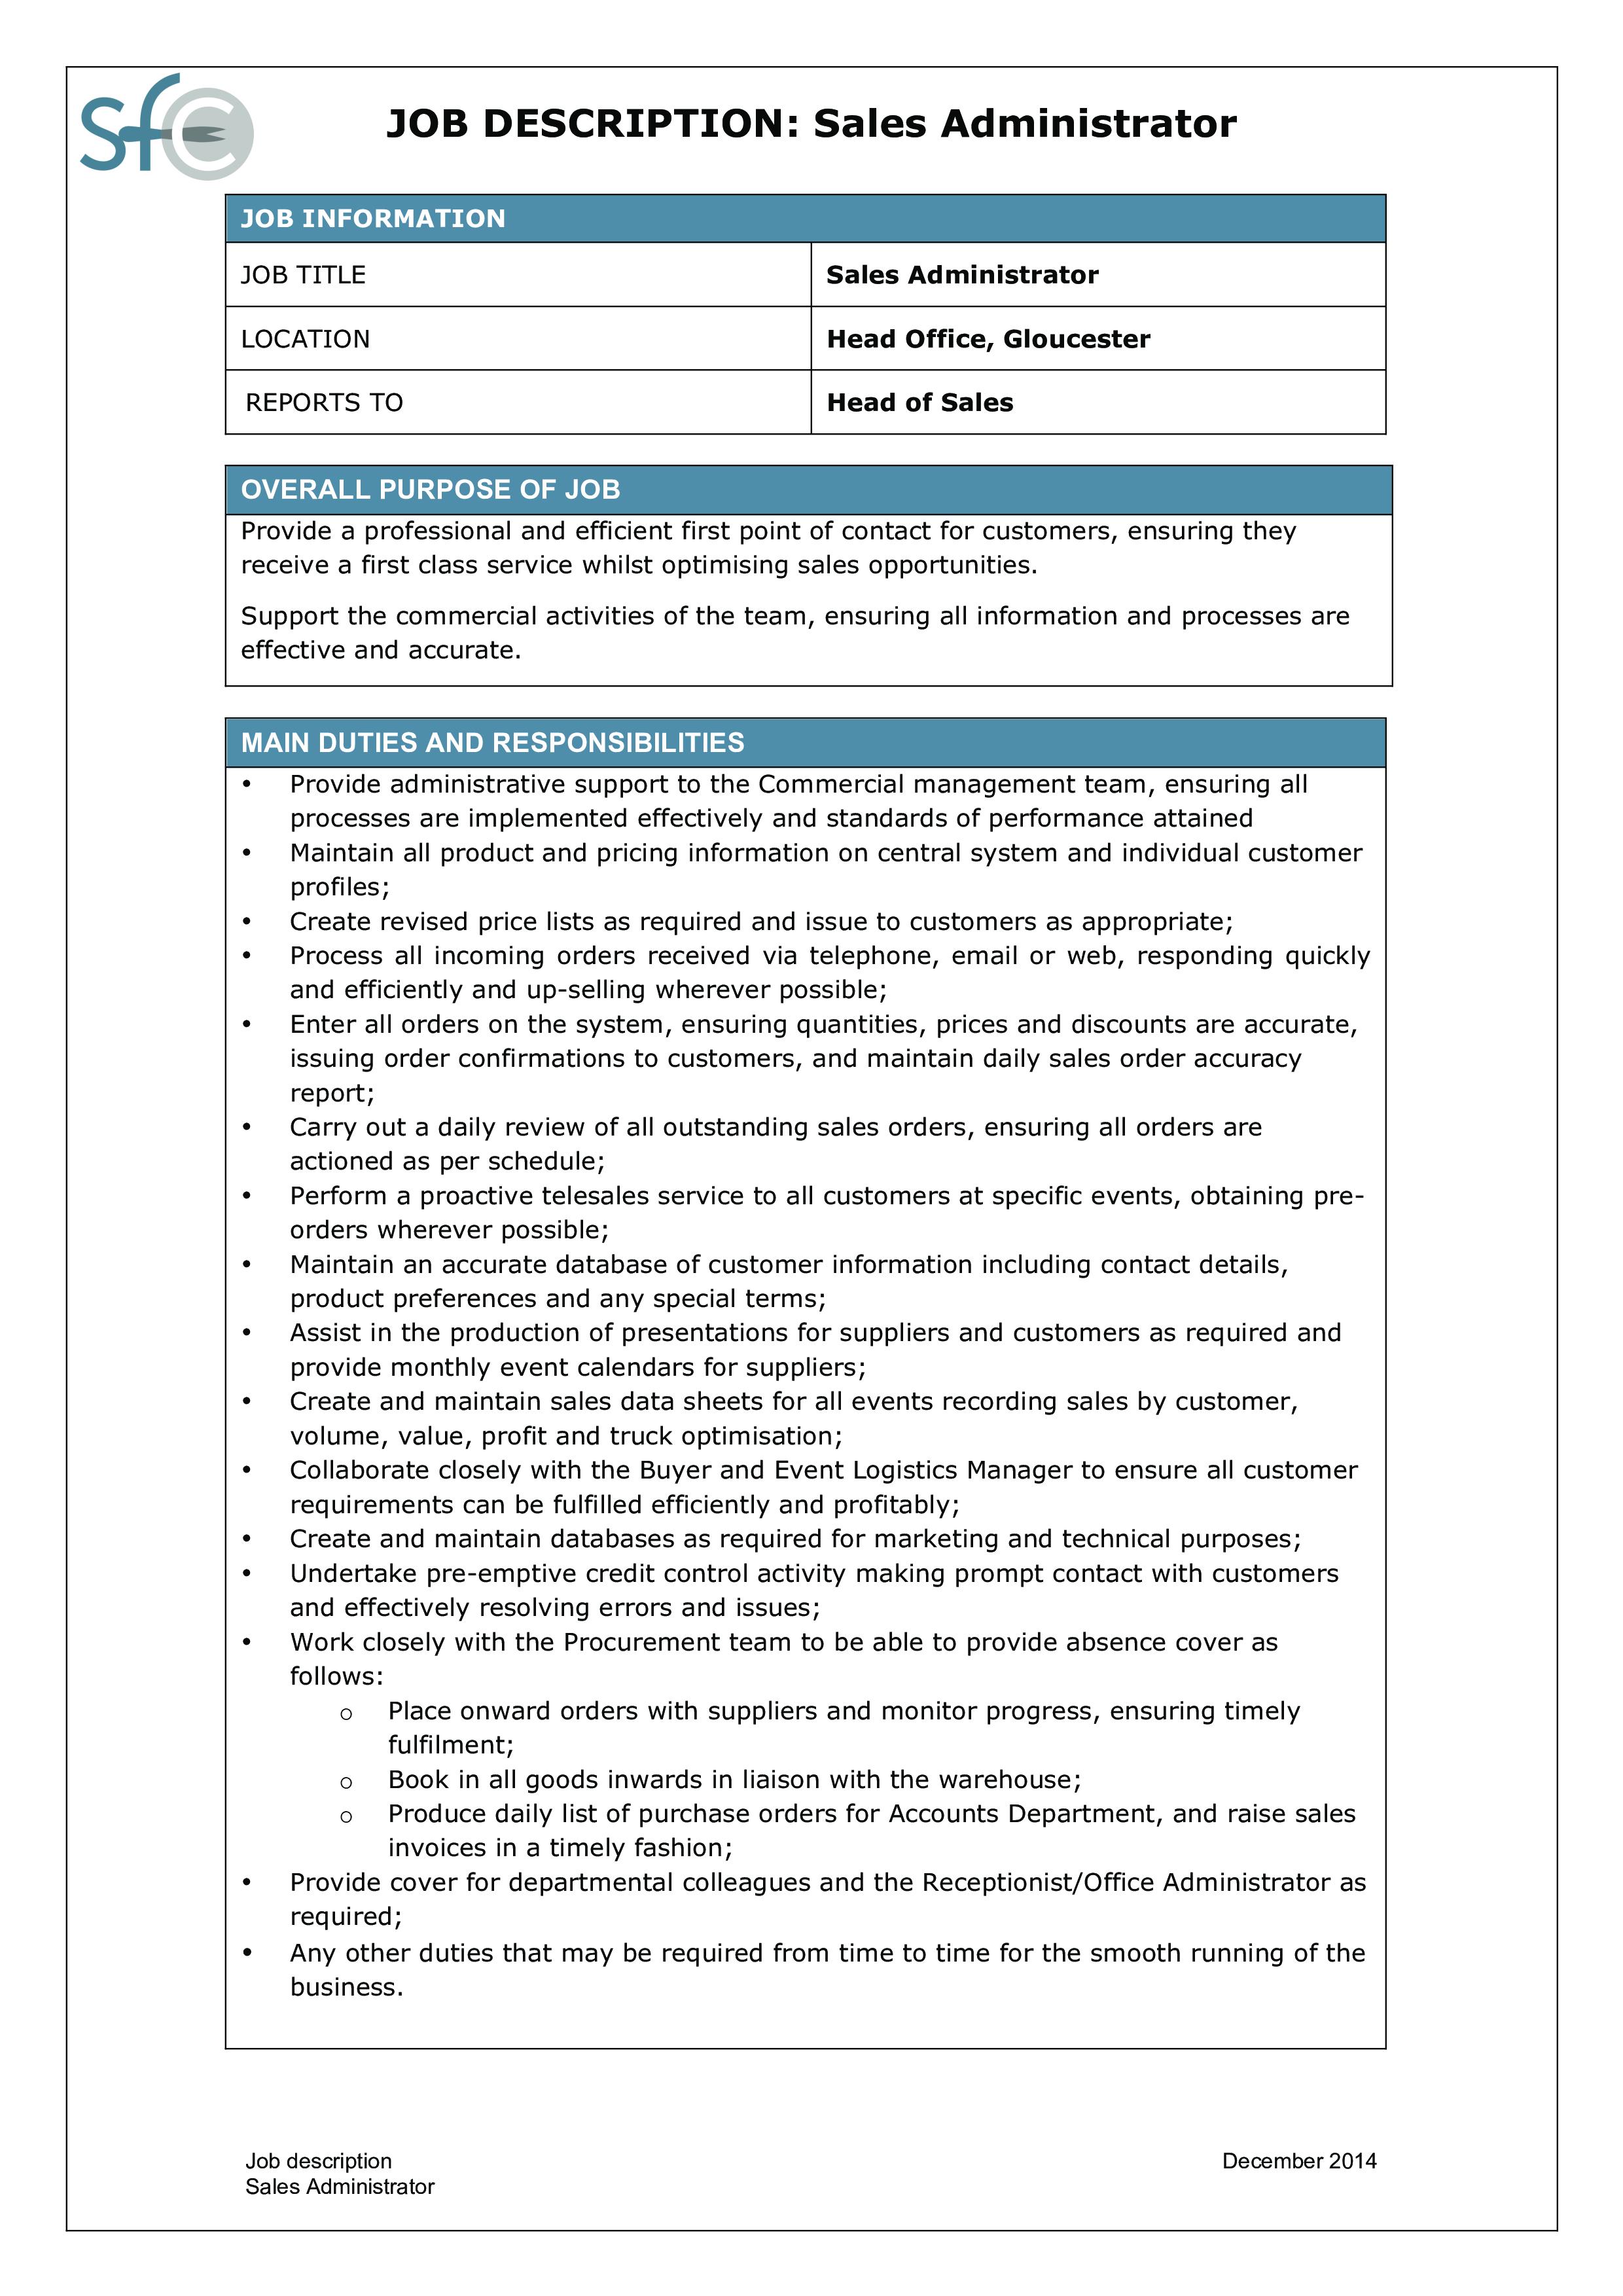 Administrator Job Description | Free Sales Administrator Job Description Templates At